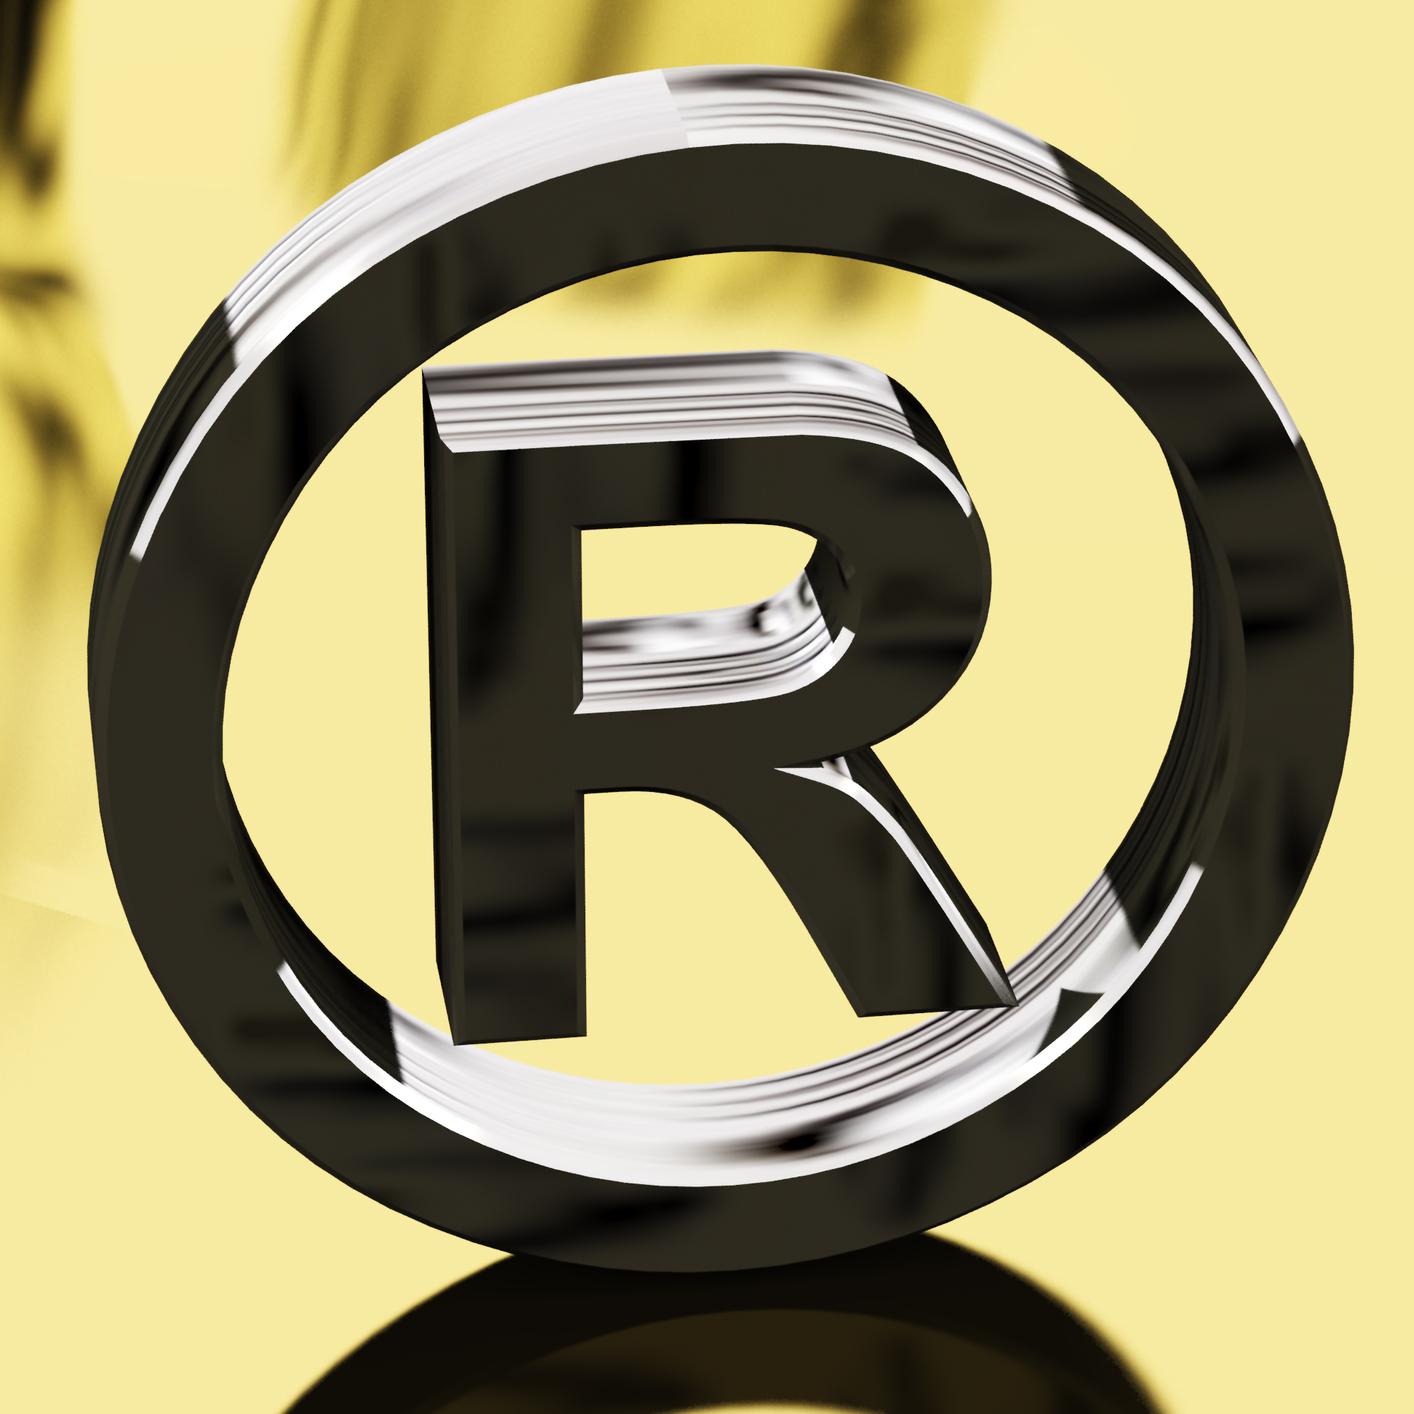 Need help registering a trademark?